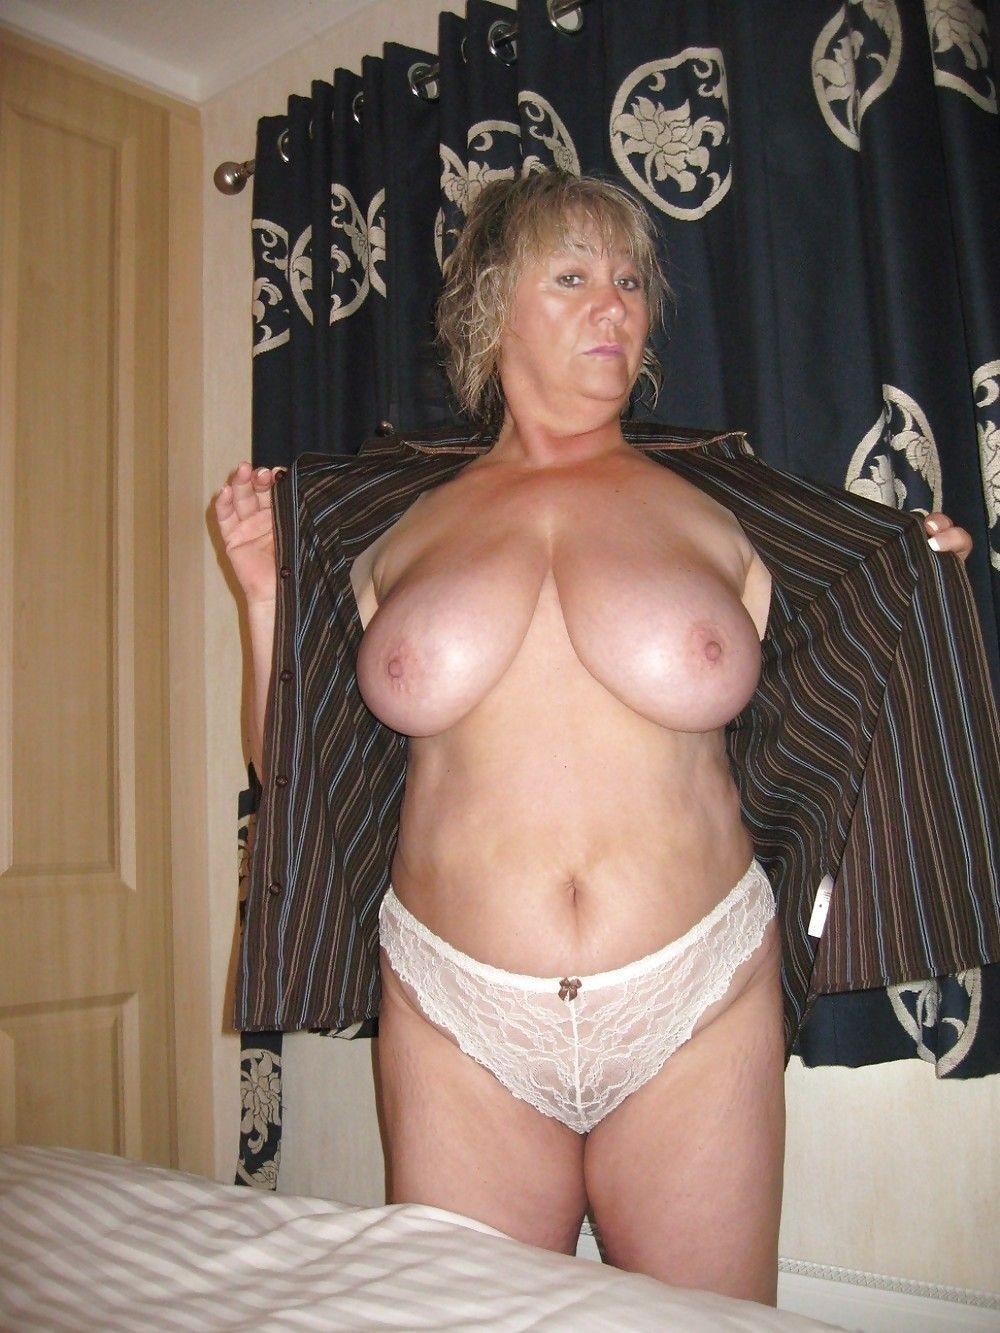 Mature woman using vibrator